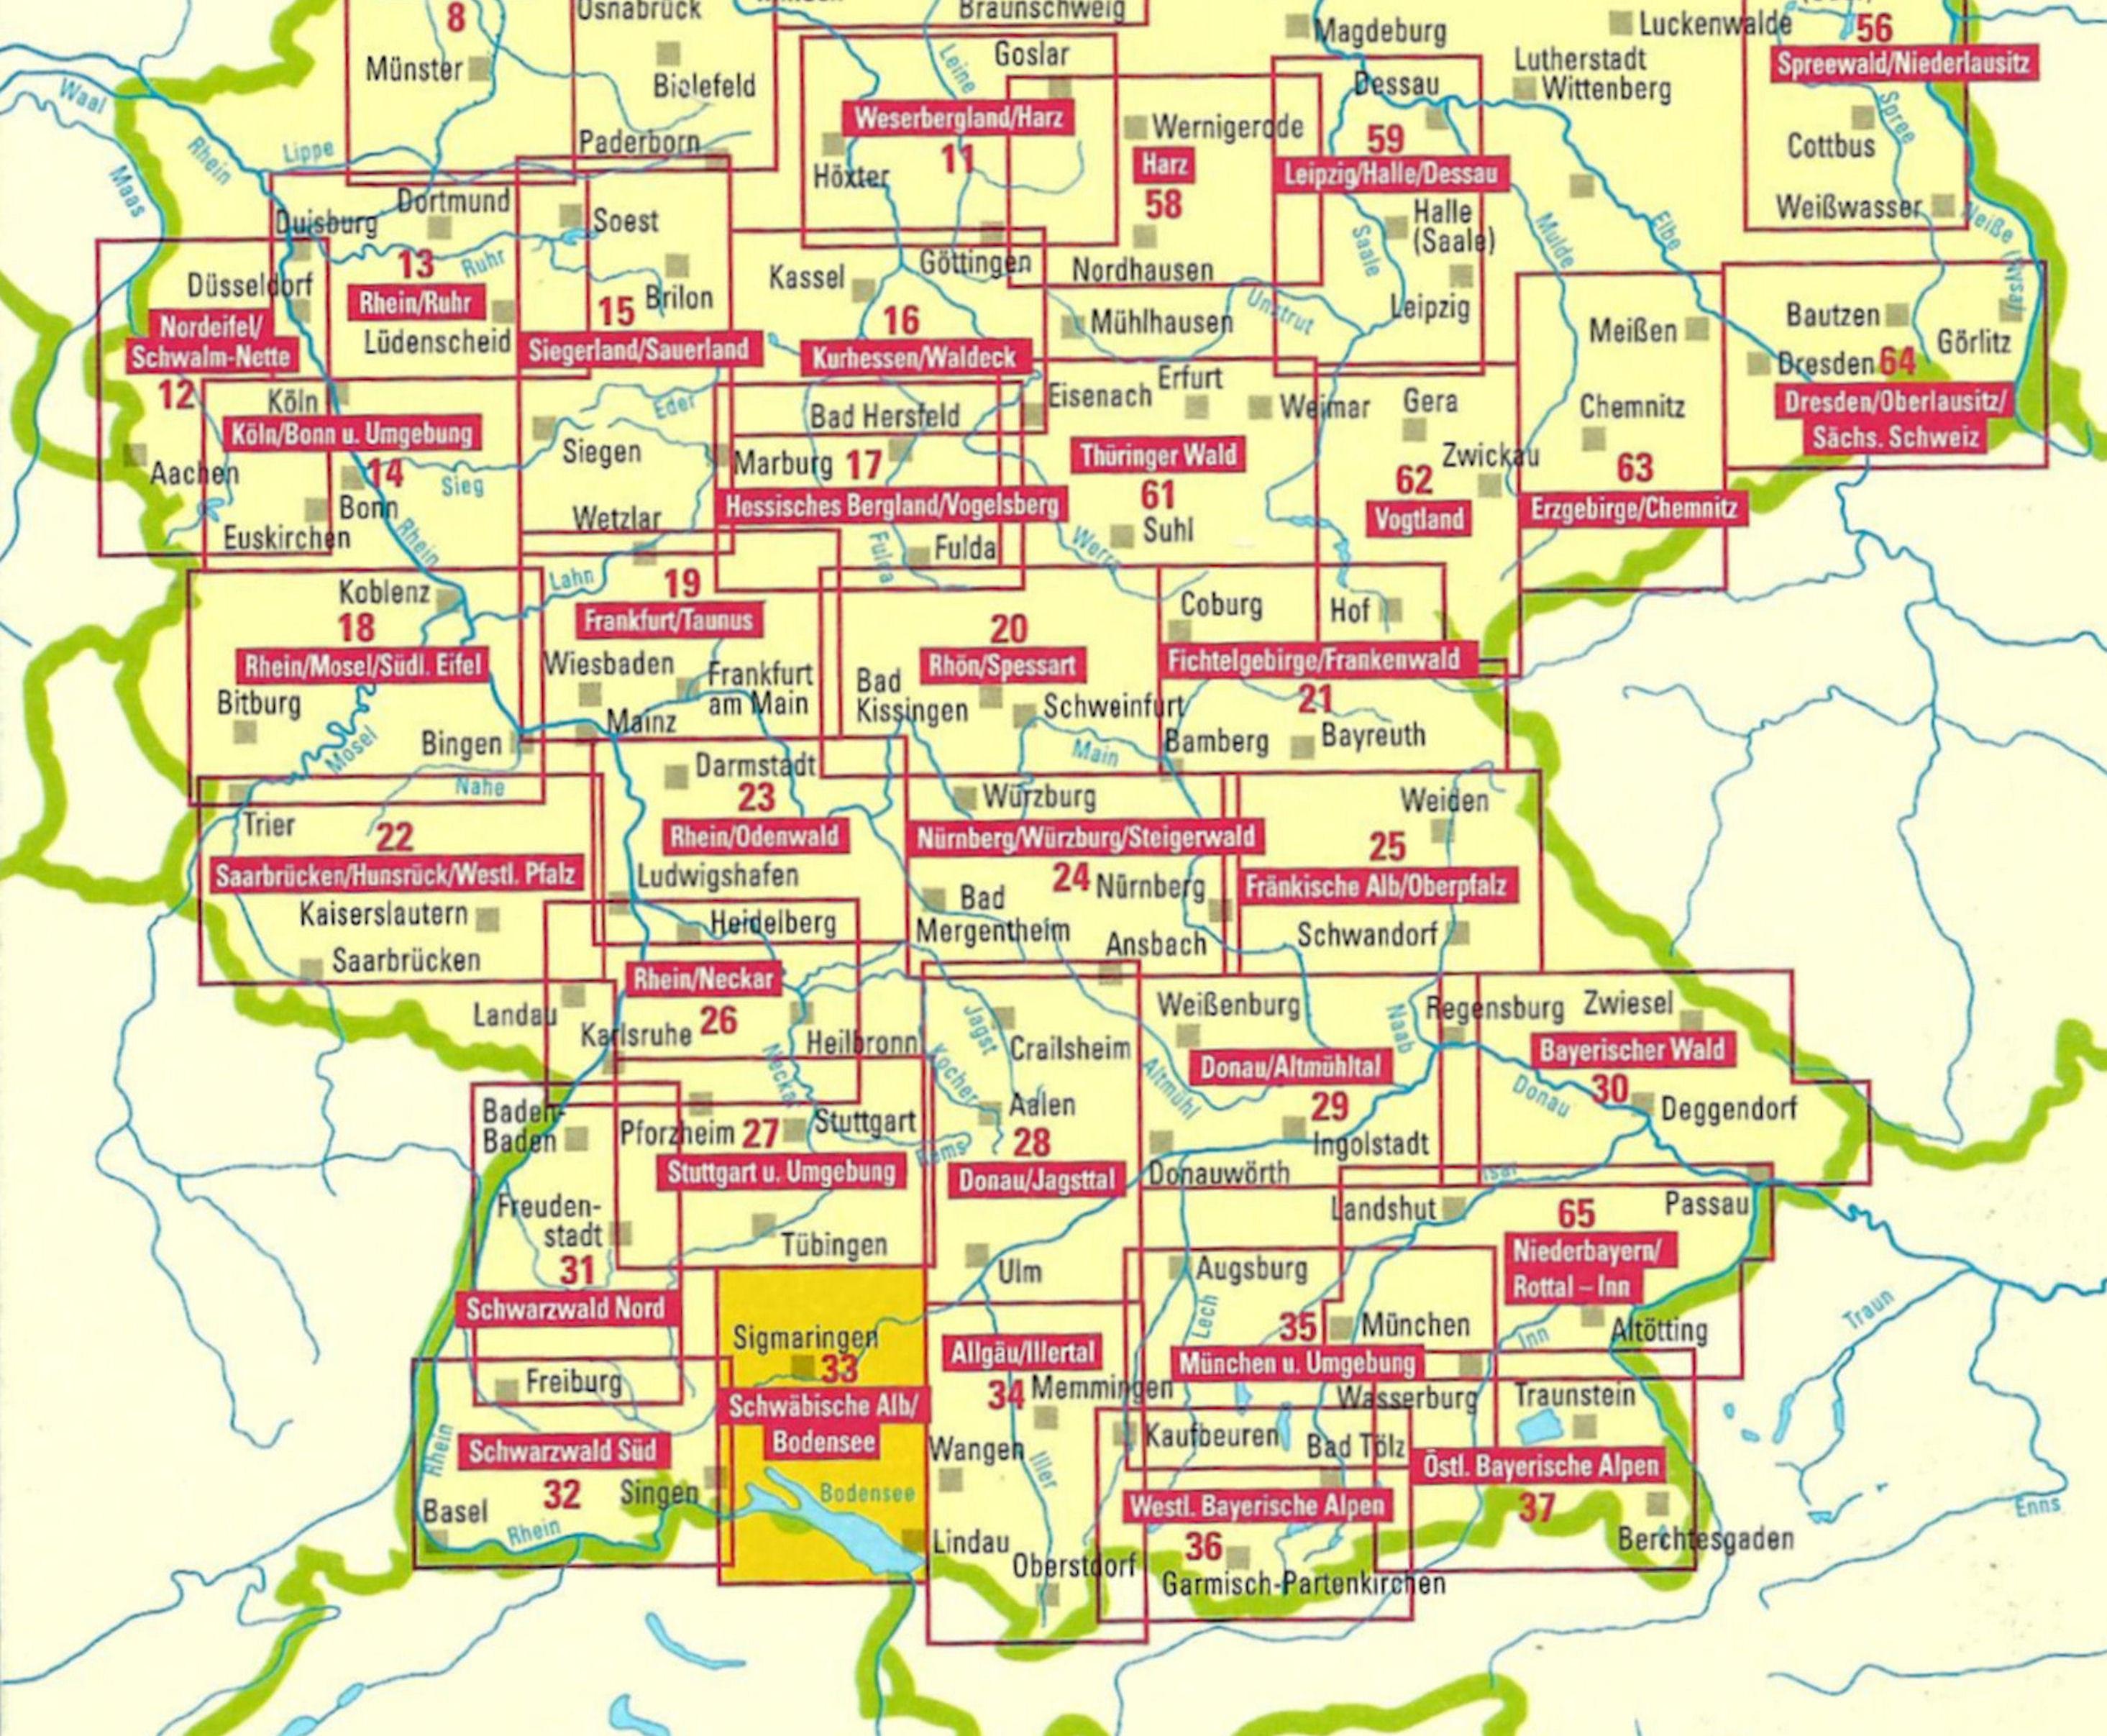 Wegenkaart Landkaart 35 Freizeitkarte Munchen Und Umgebung